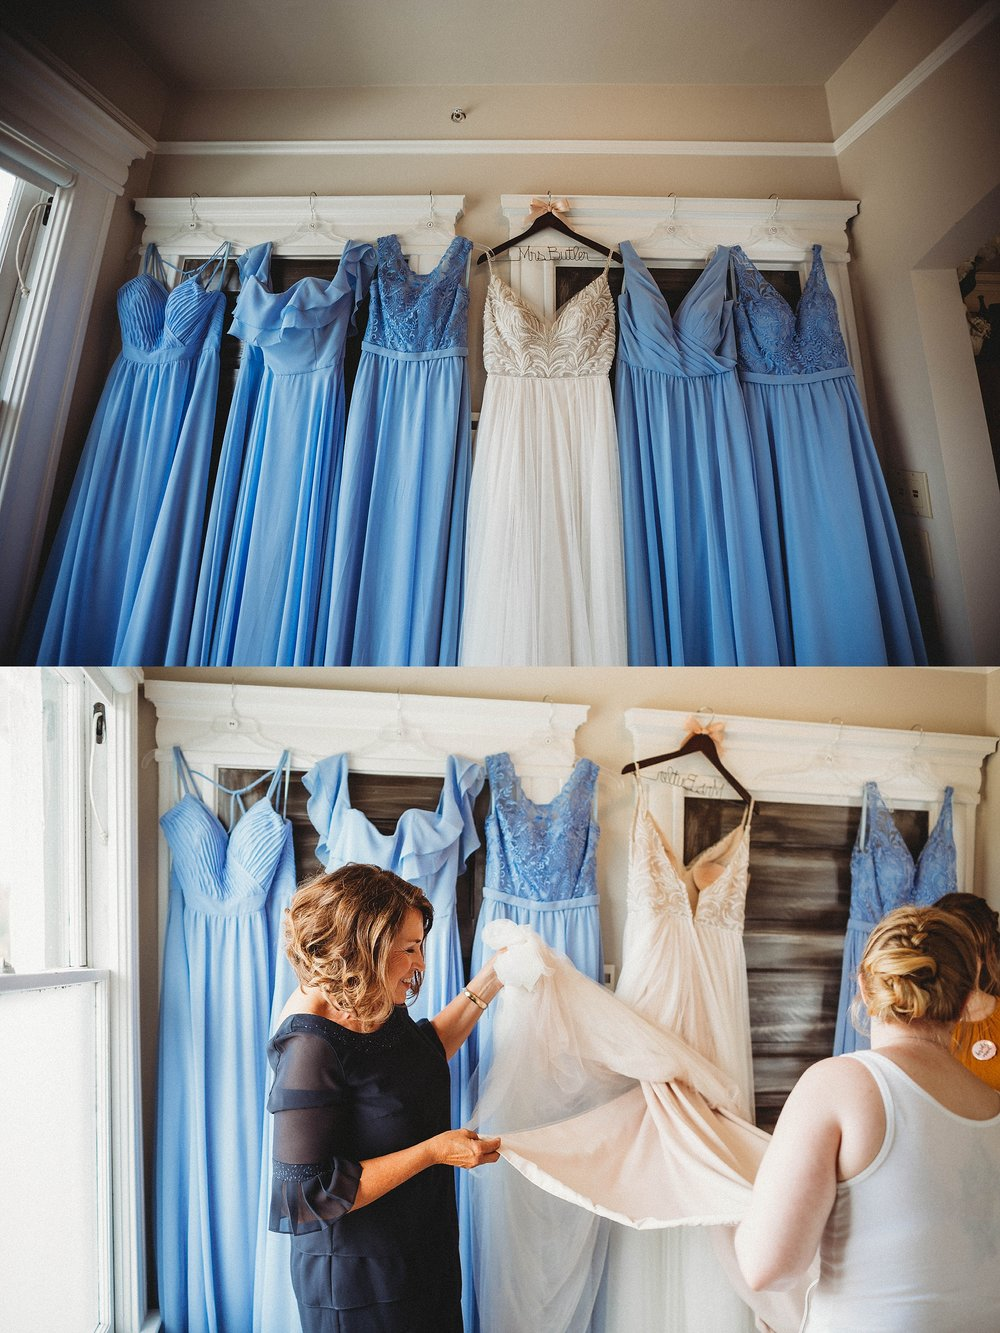 olson mansion wedding photography - jill and garrett - ashley vos photography - seattle area wedding photographer-15.jpg